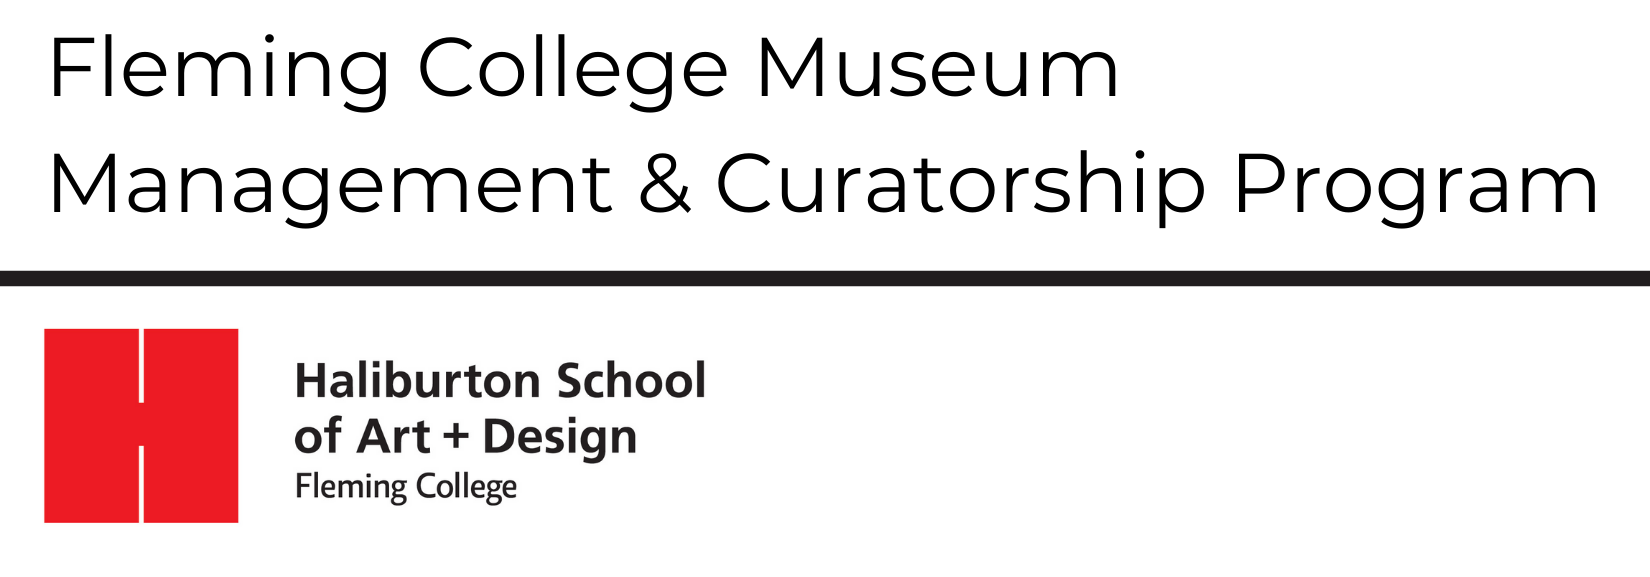 Fleming College Museum Management & Curatorship Program